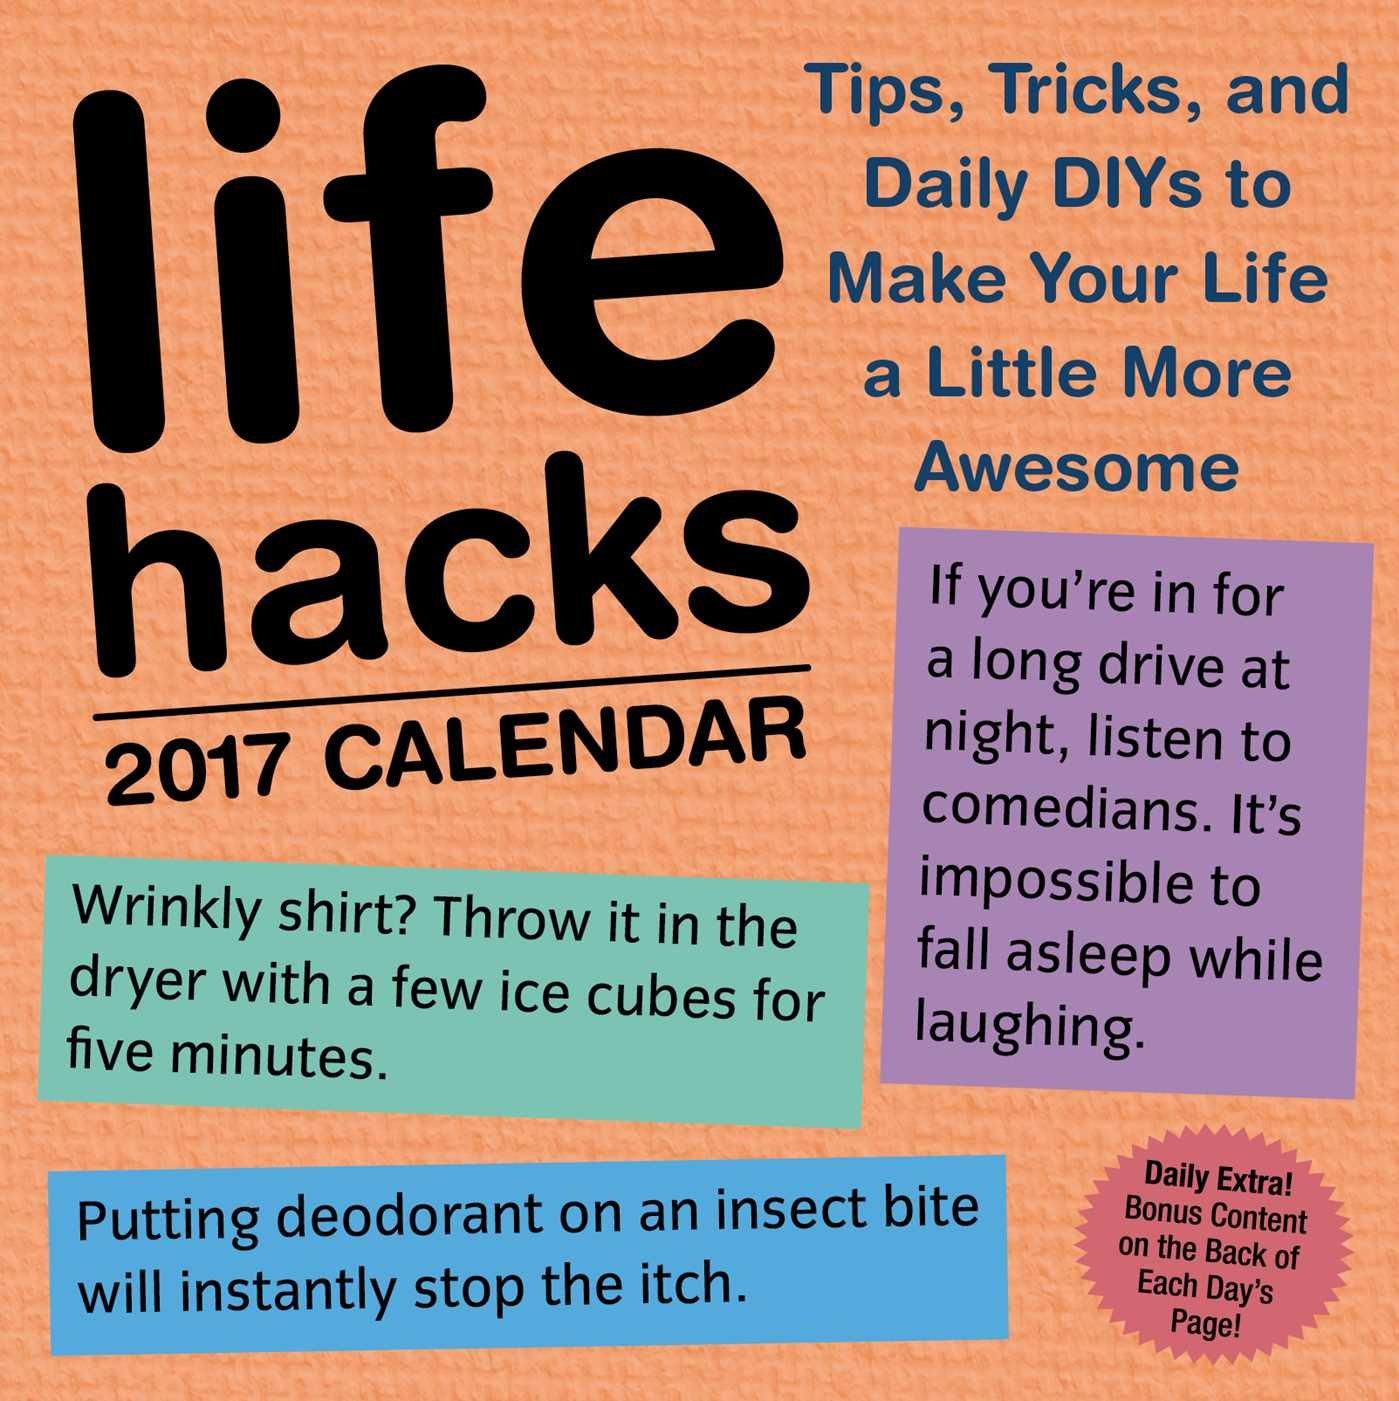 Life Hacks 2017 Day Calendar product image